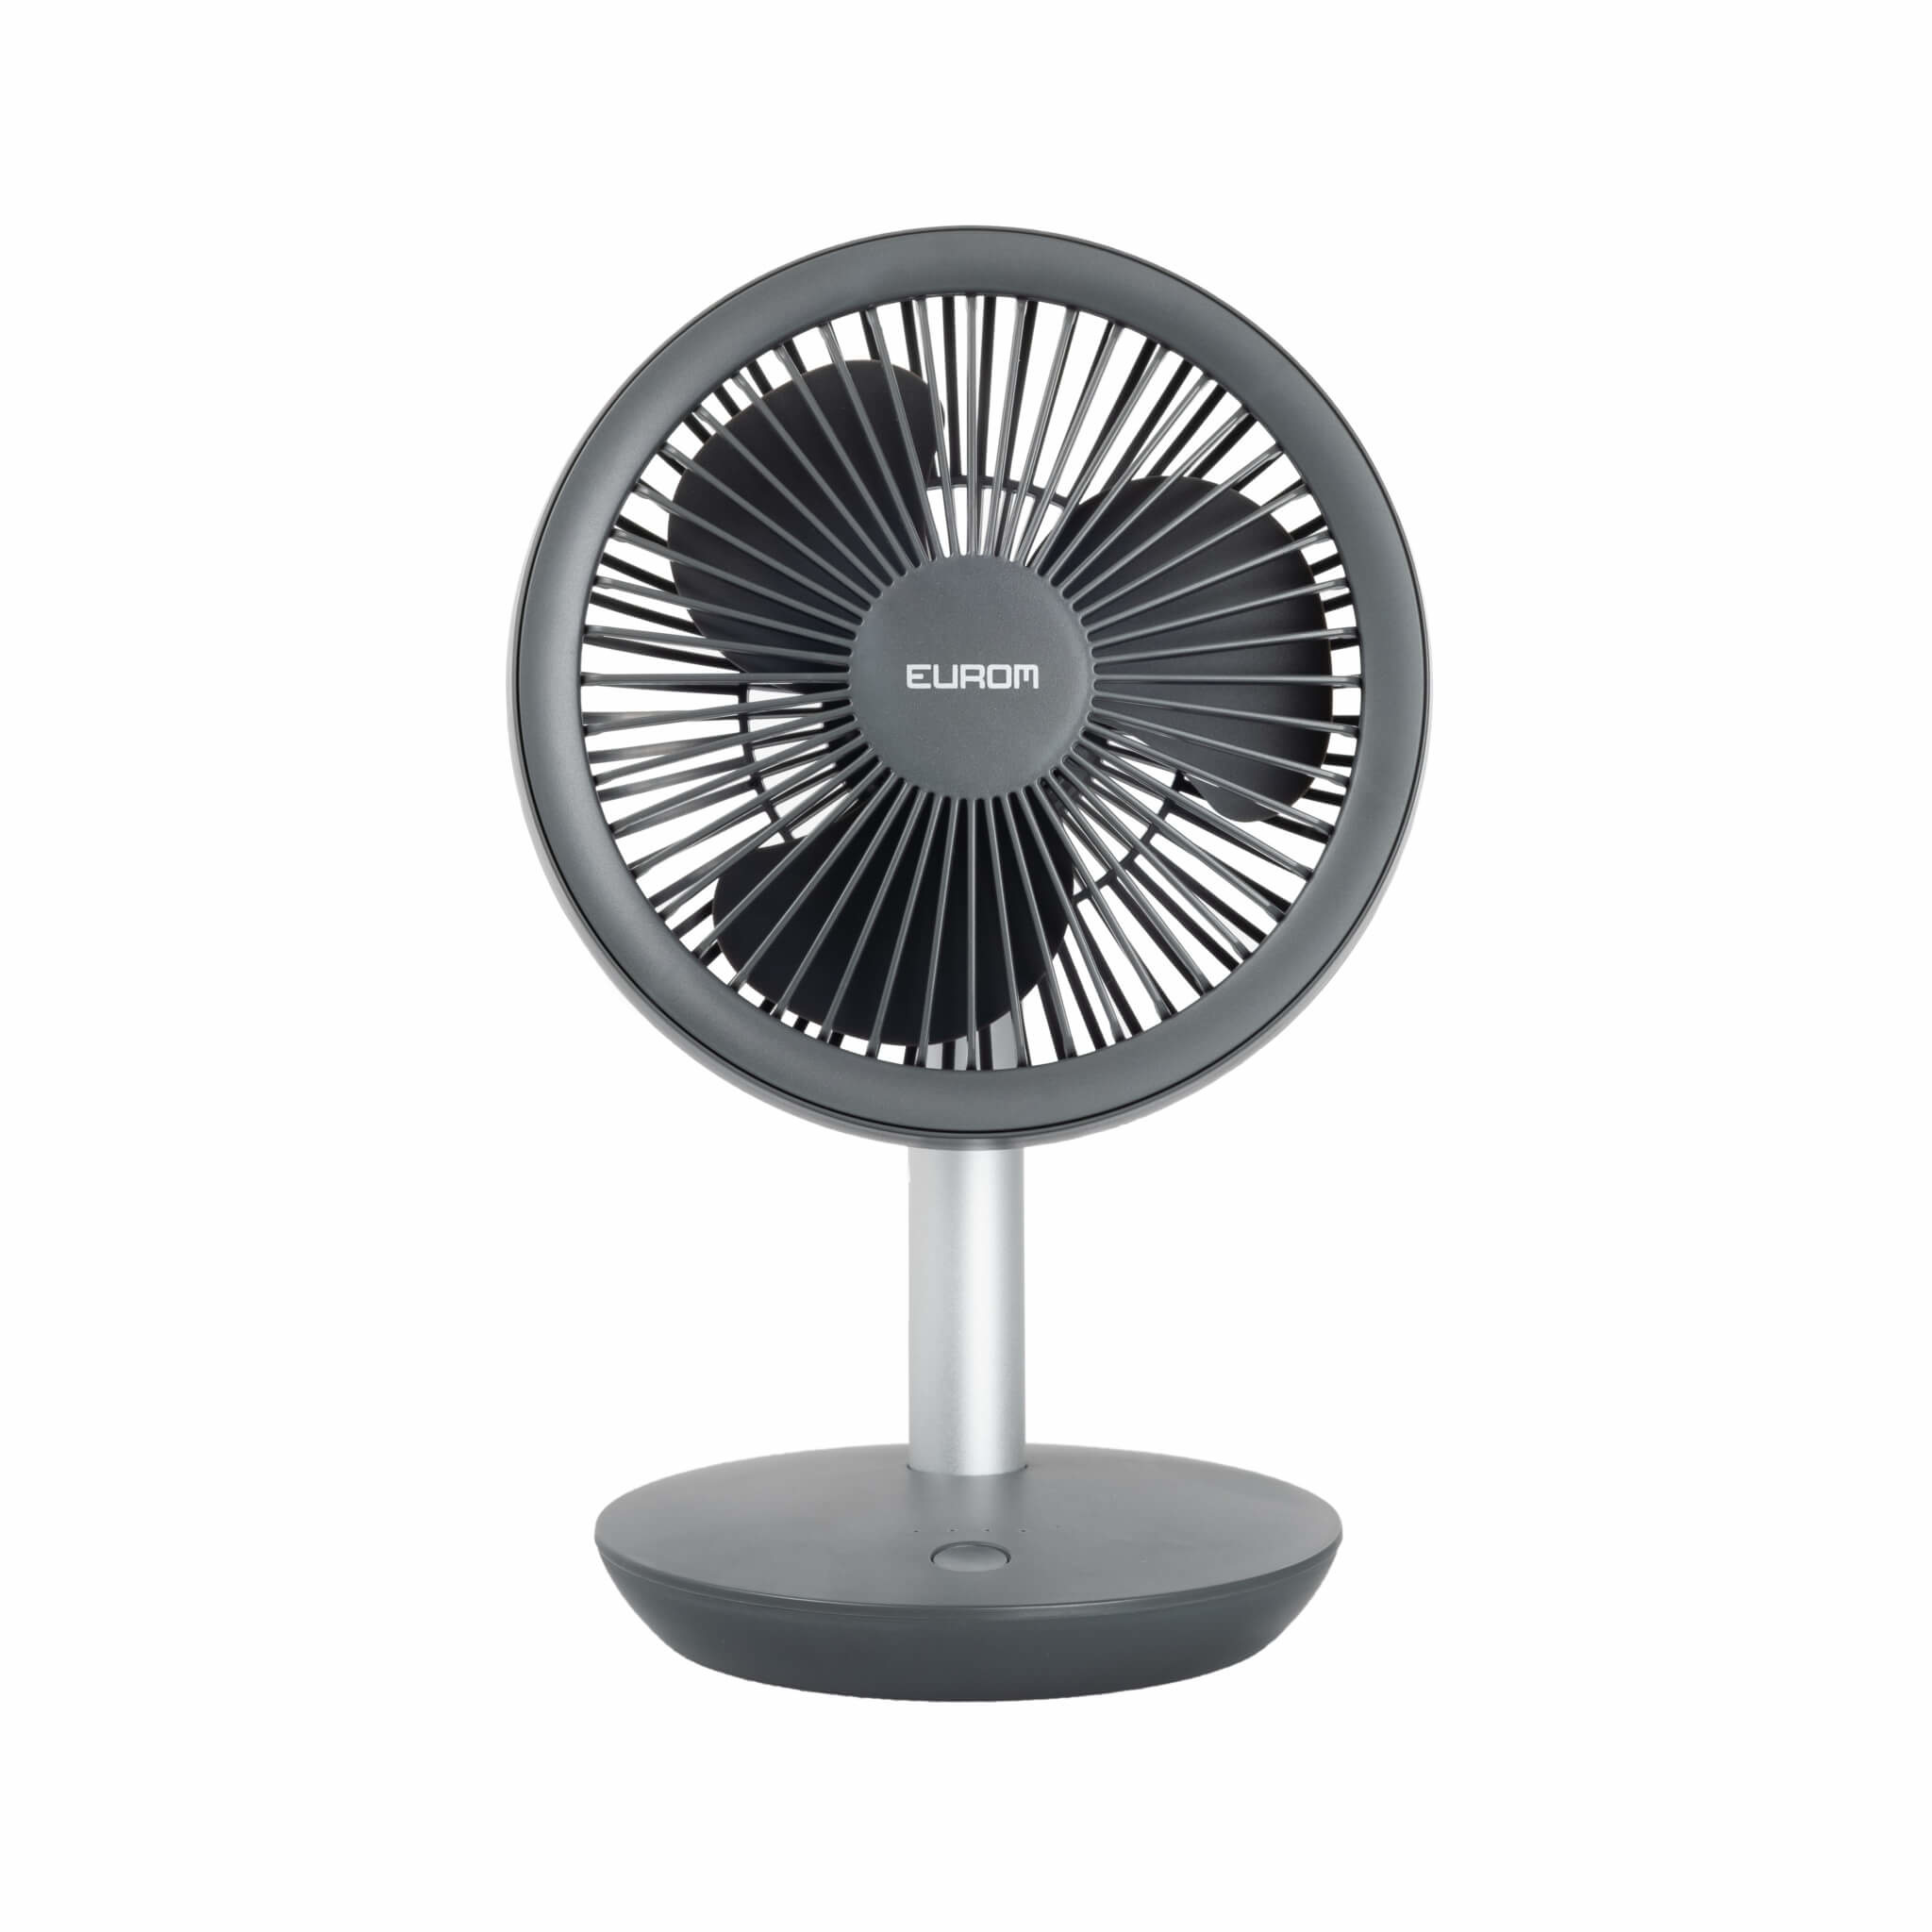 Ventilator Vento cordless tafelventilator